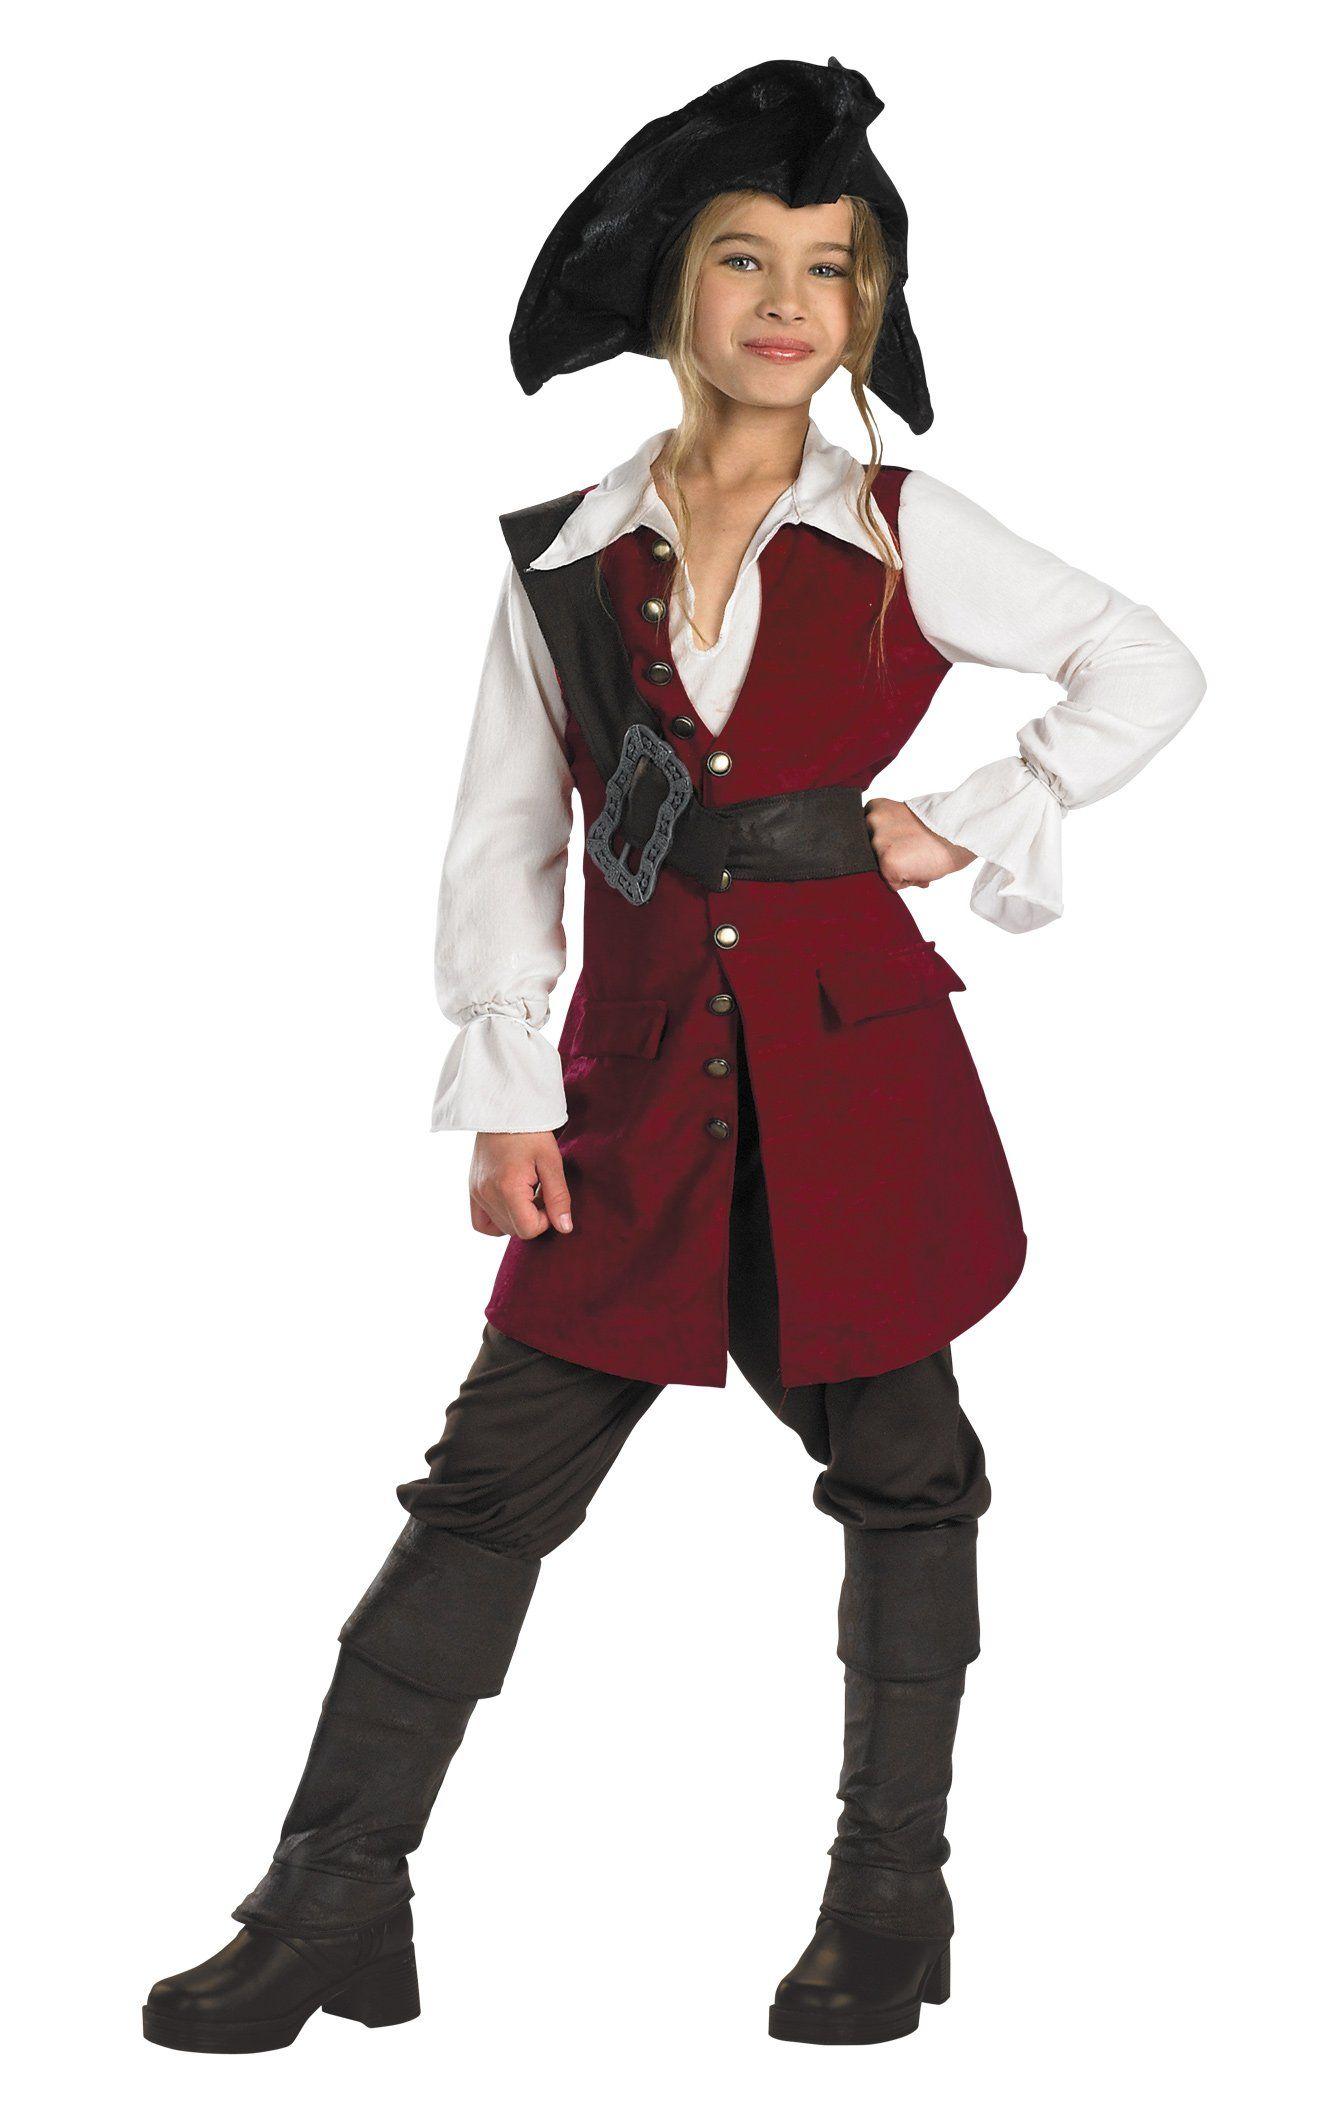 Pirates of the Caribbean - Captain Jack Sparrow Prestige Child Costume  sc 1 st  Pinterest & Pirates of the Caribbean - Captain Jack Sparrow Prestige Child ...